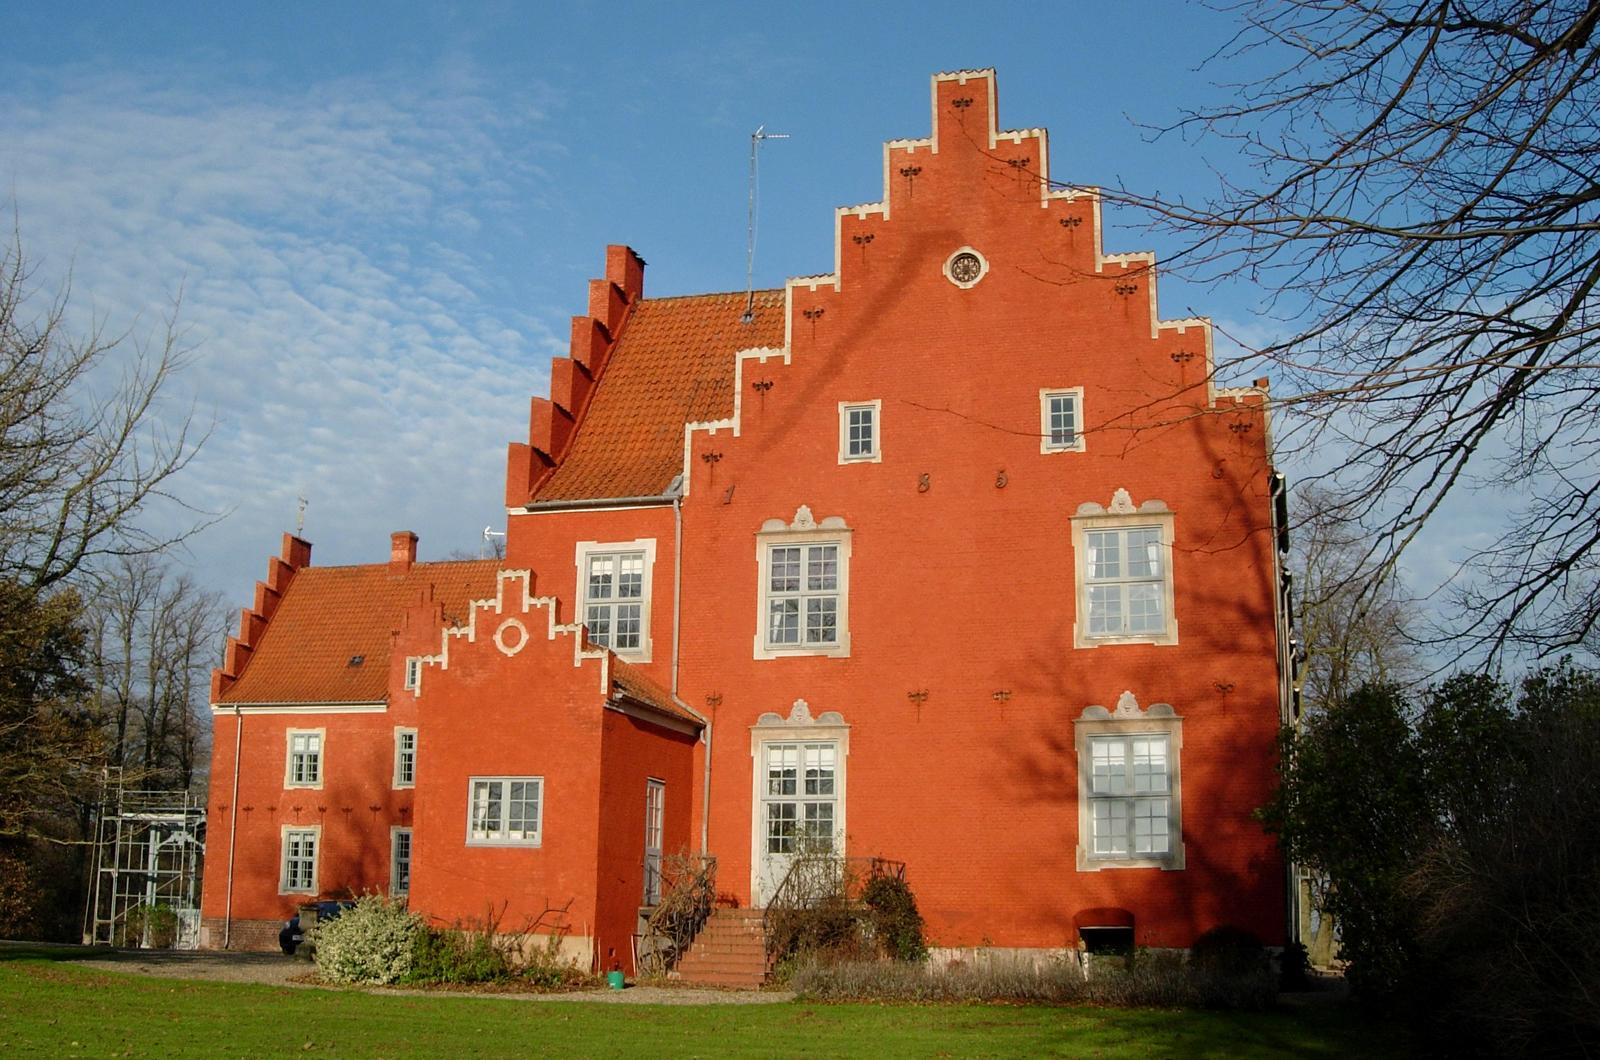 aastrup-kloster-3